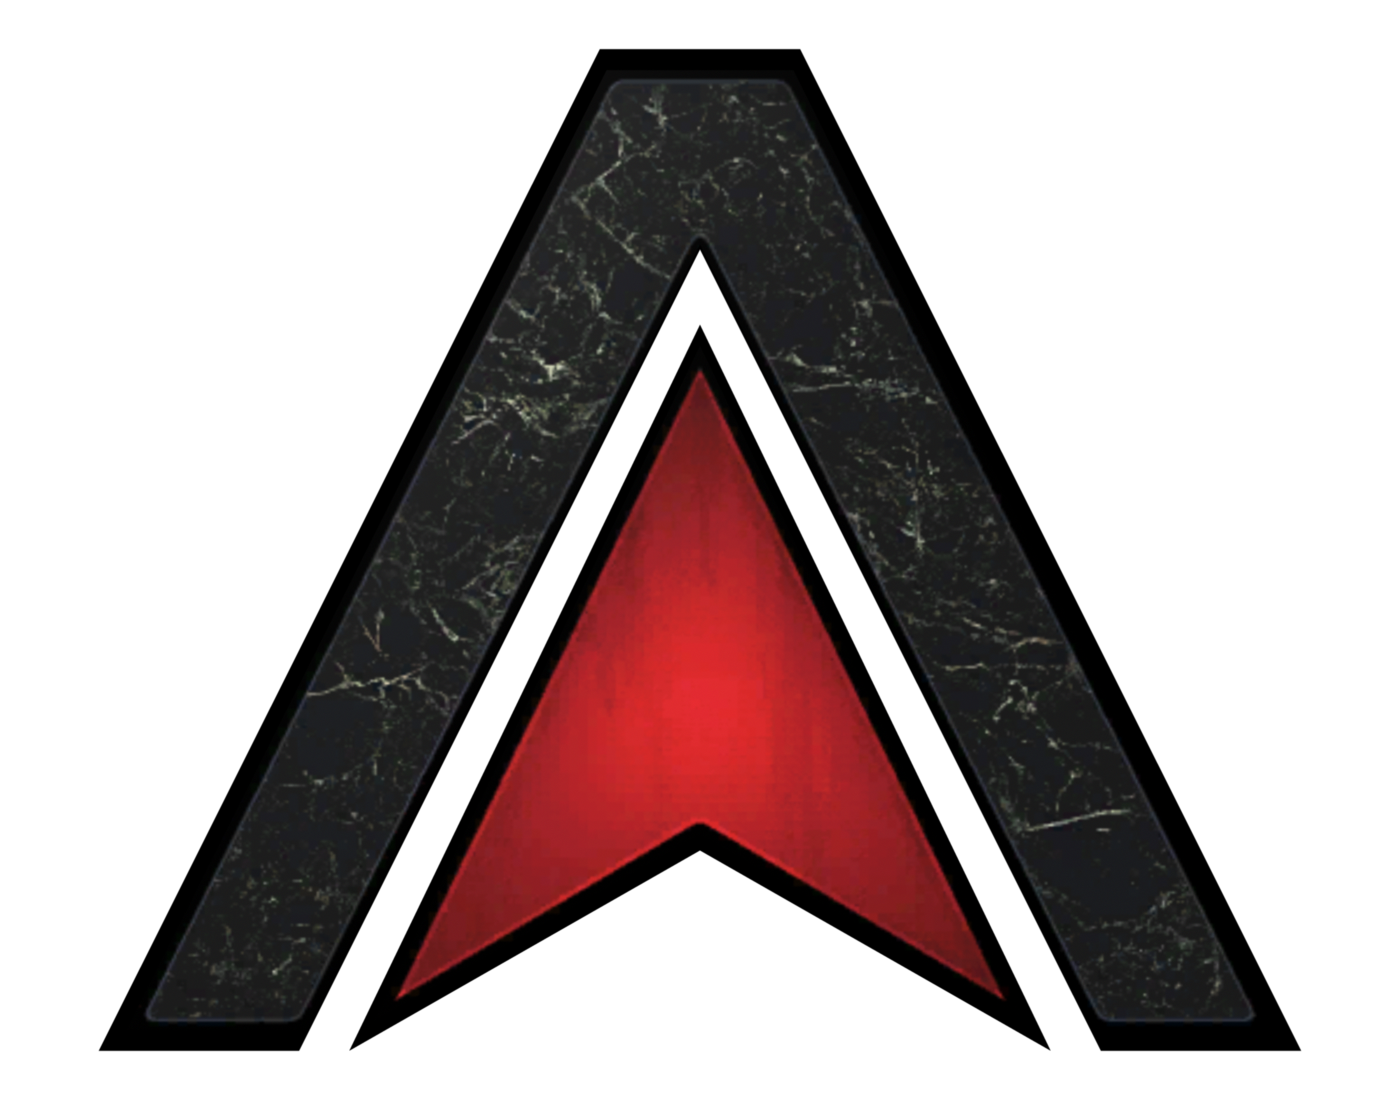 Image Atlas Logo Awg Call Of Duty Wiki Fandom Powered By Wikia